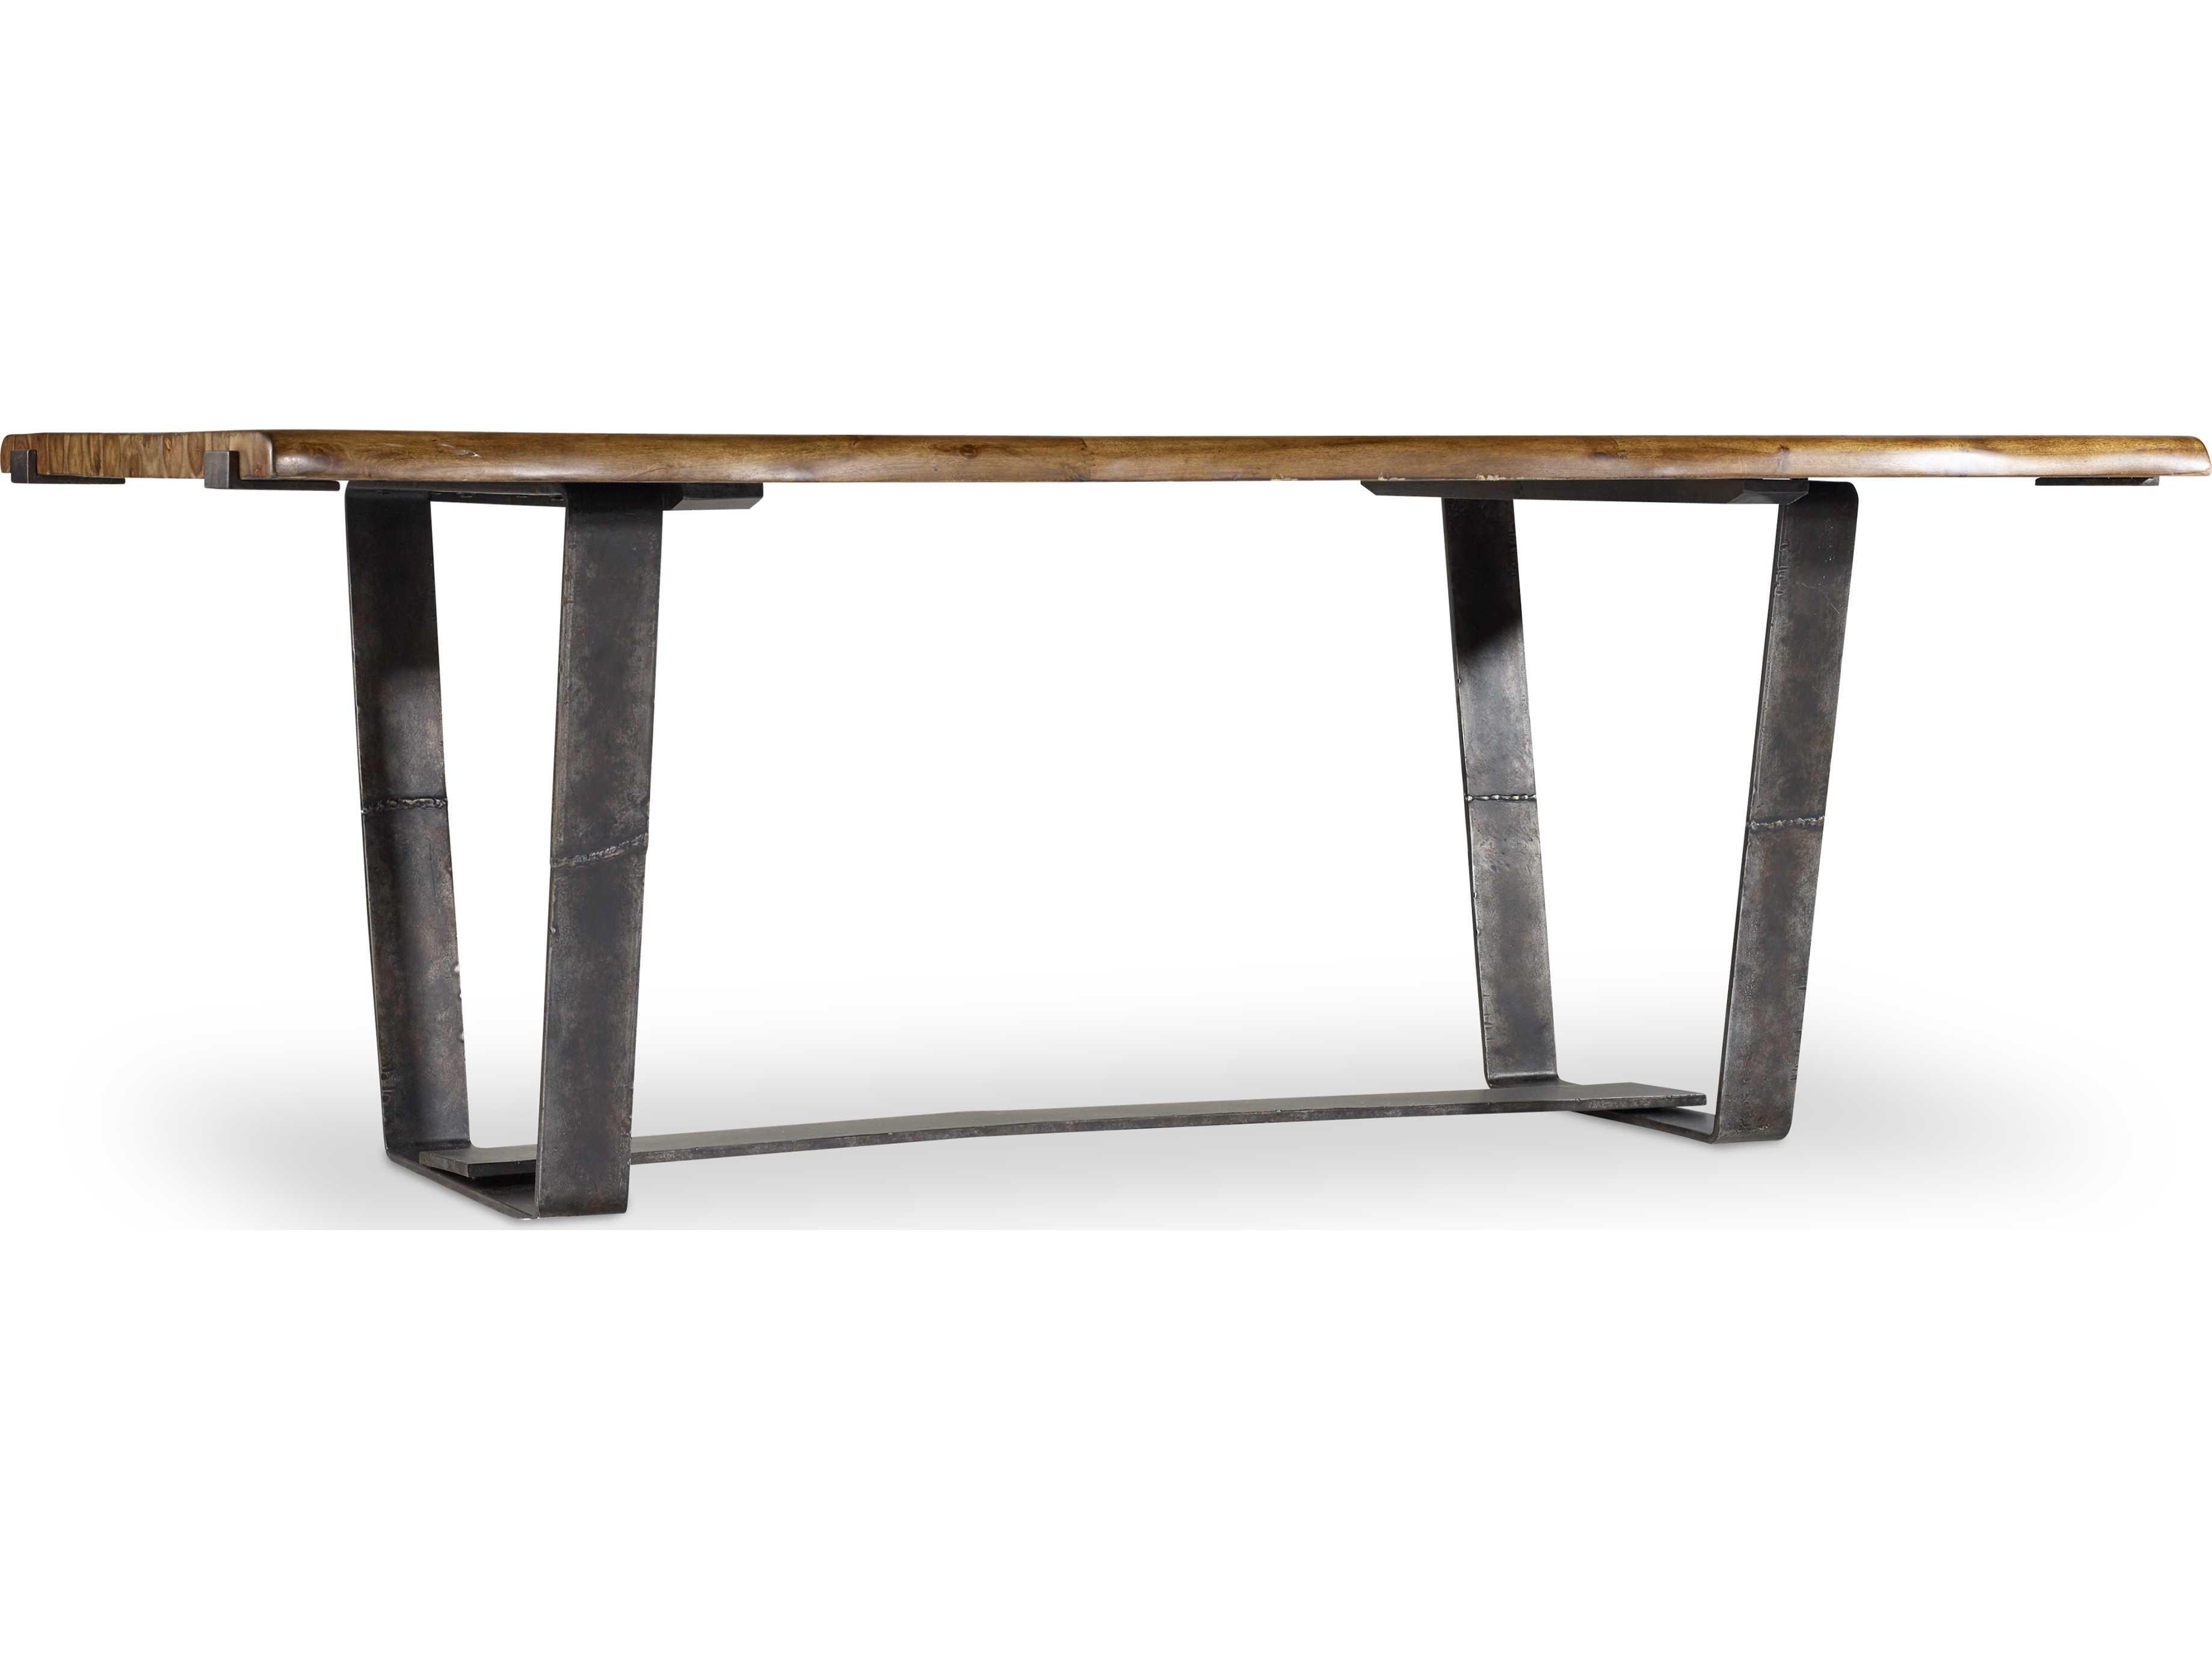 hooker furniture live edge 83 39 39 l x 42 39 39 w rectangular dining table hoo559075200. Black Bedroom Furniture Sets. Home Design Ideas